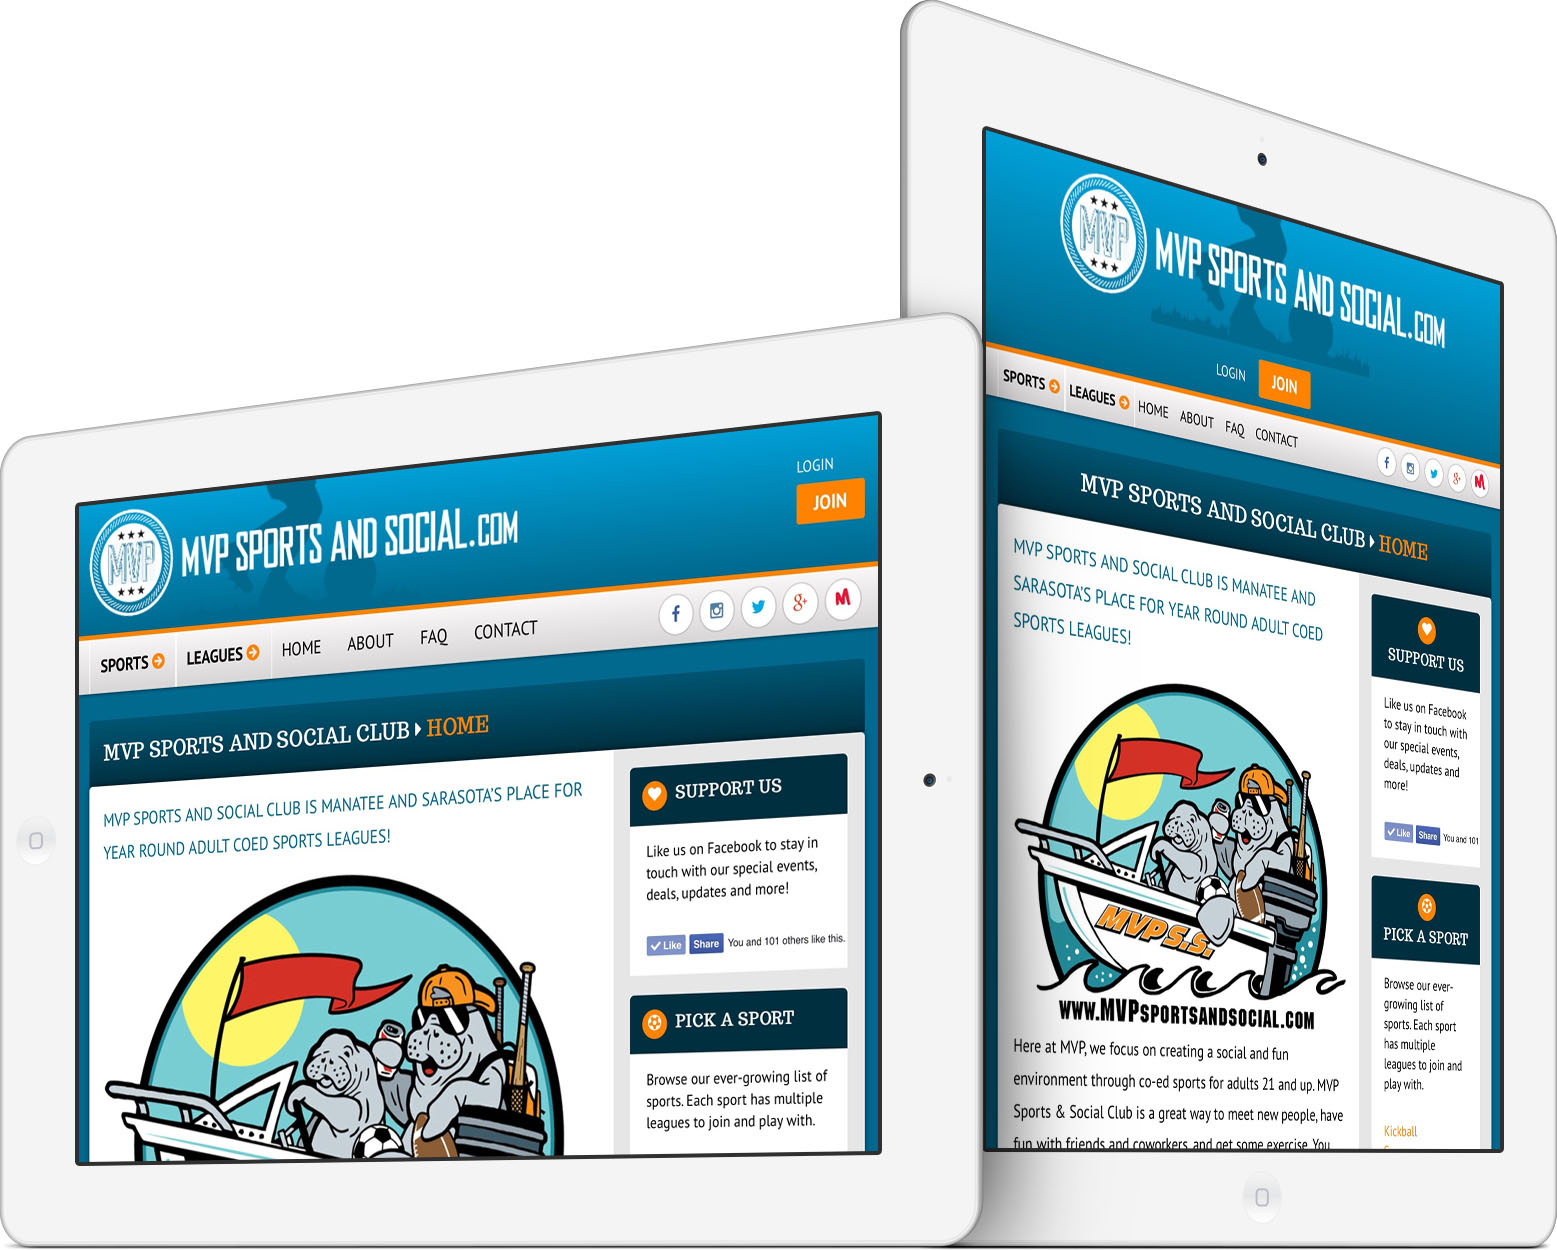 MVP Sports and Social Club Responsive Web Design on an iPad